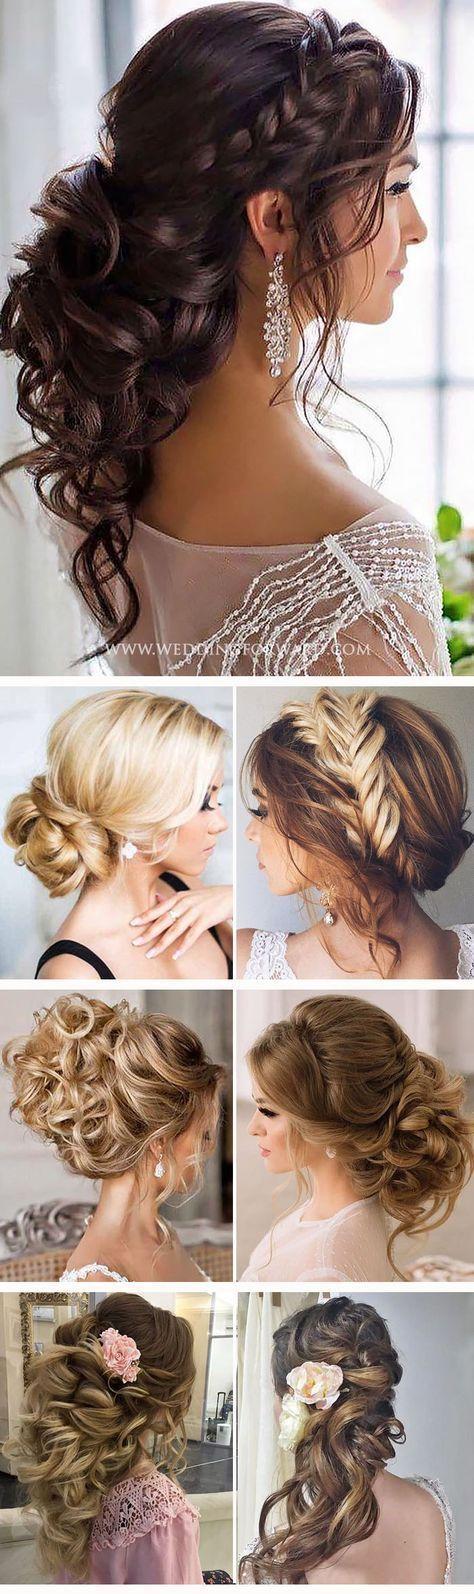 The 25+ best Long wedding hairstyles ideas on Pinterest | Wedding ...